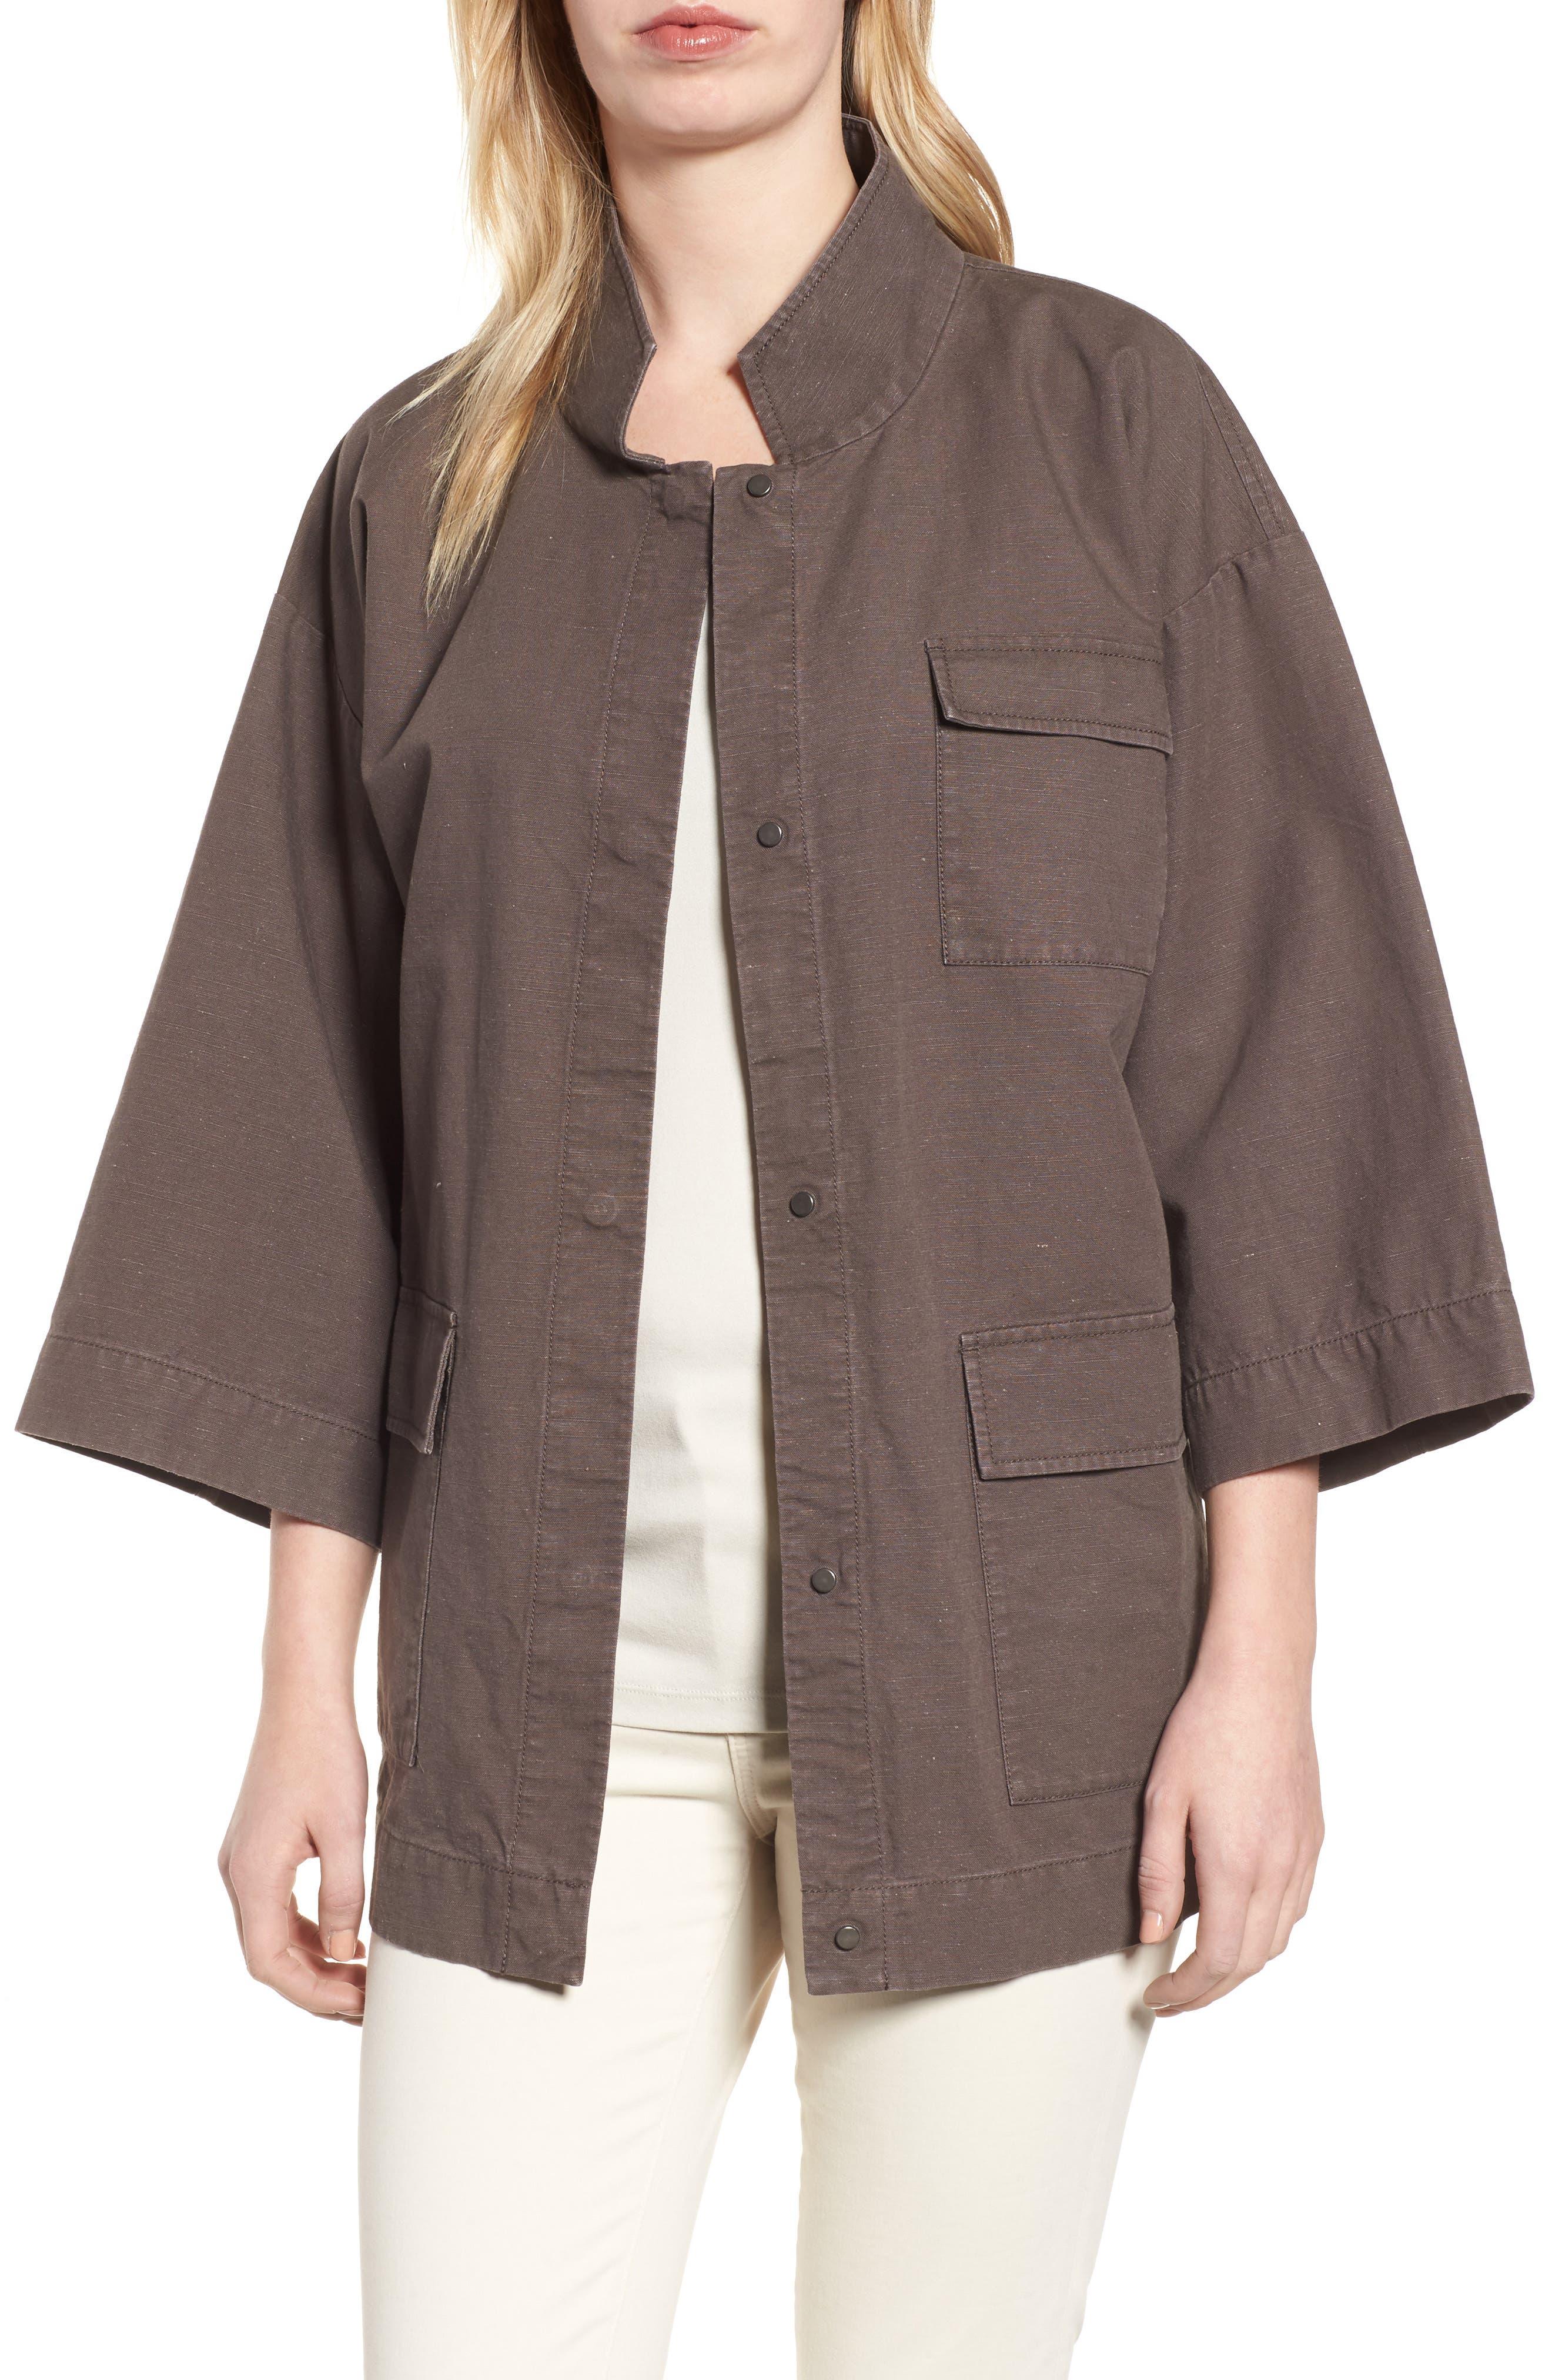 Organic Cotton & Hemp Jacket,                             Main thumbnail 1, color,                             024